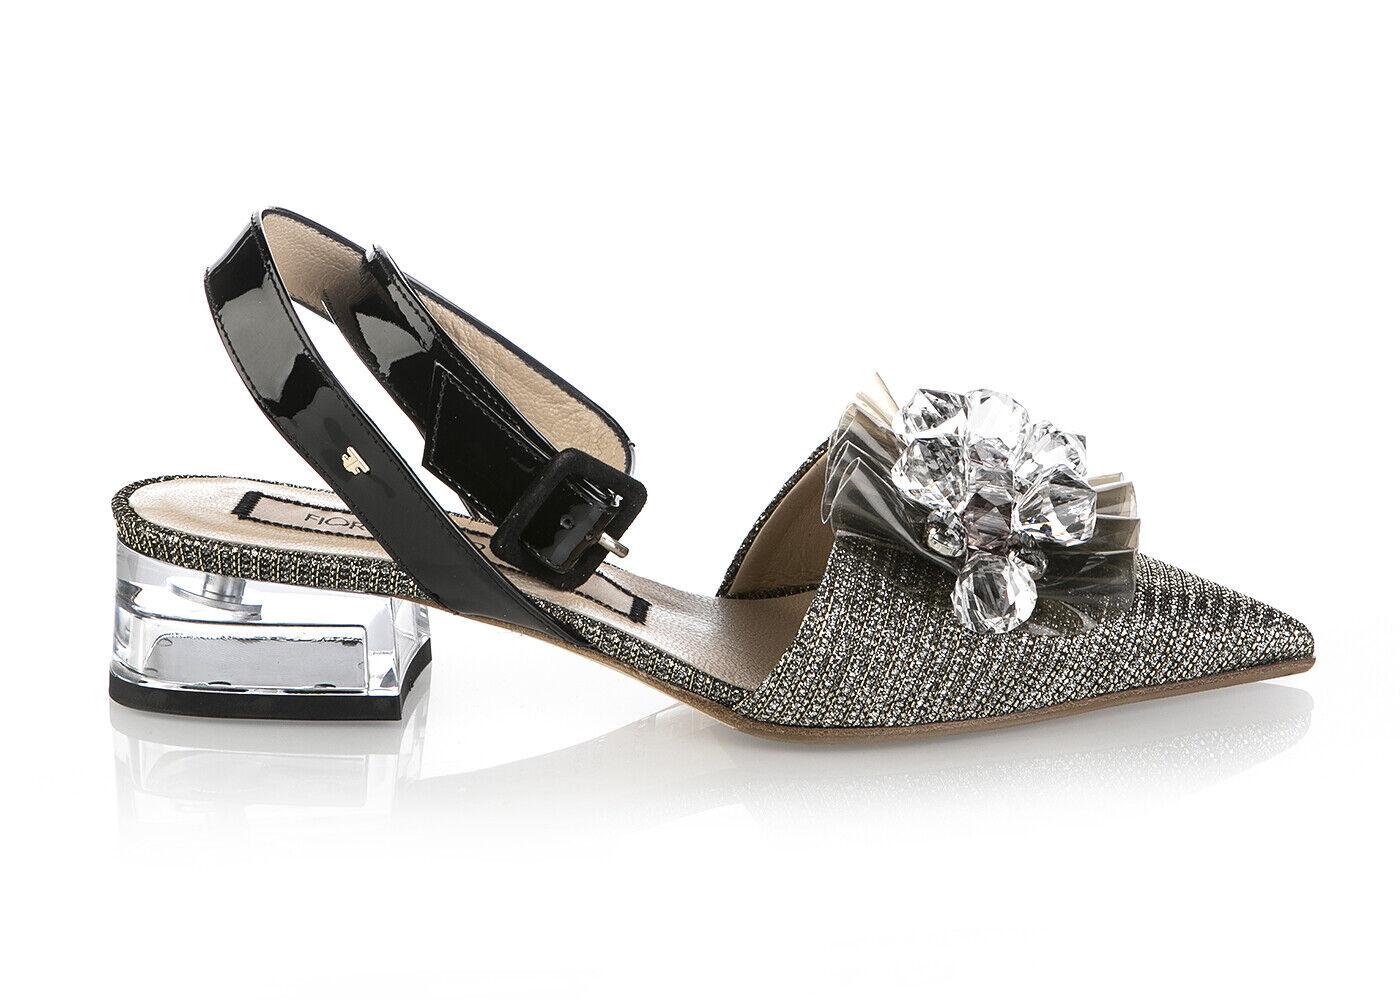 Authentic Fiorangelo Italian Leather Designer Sandals New Sizes 6,7,8,10 gold